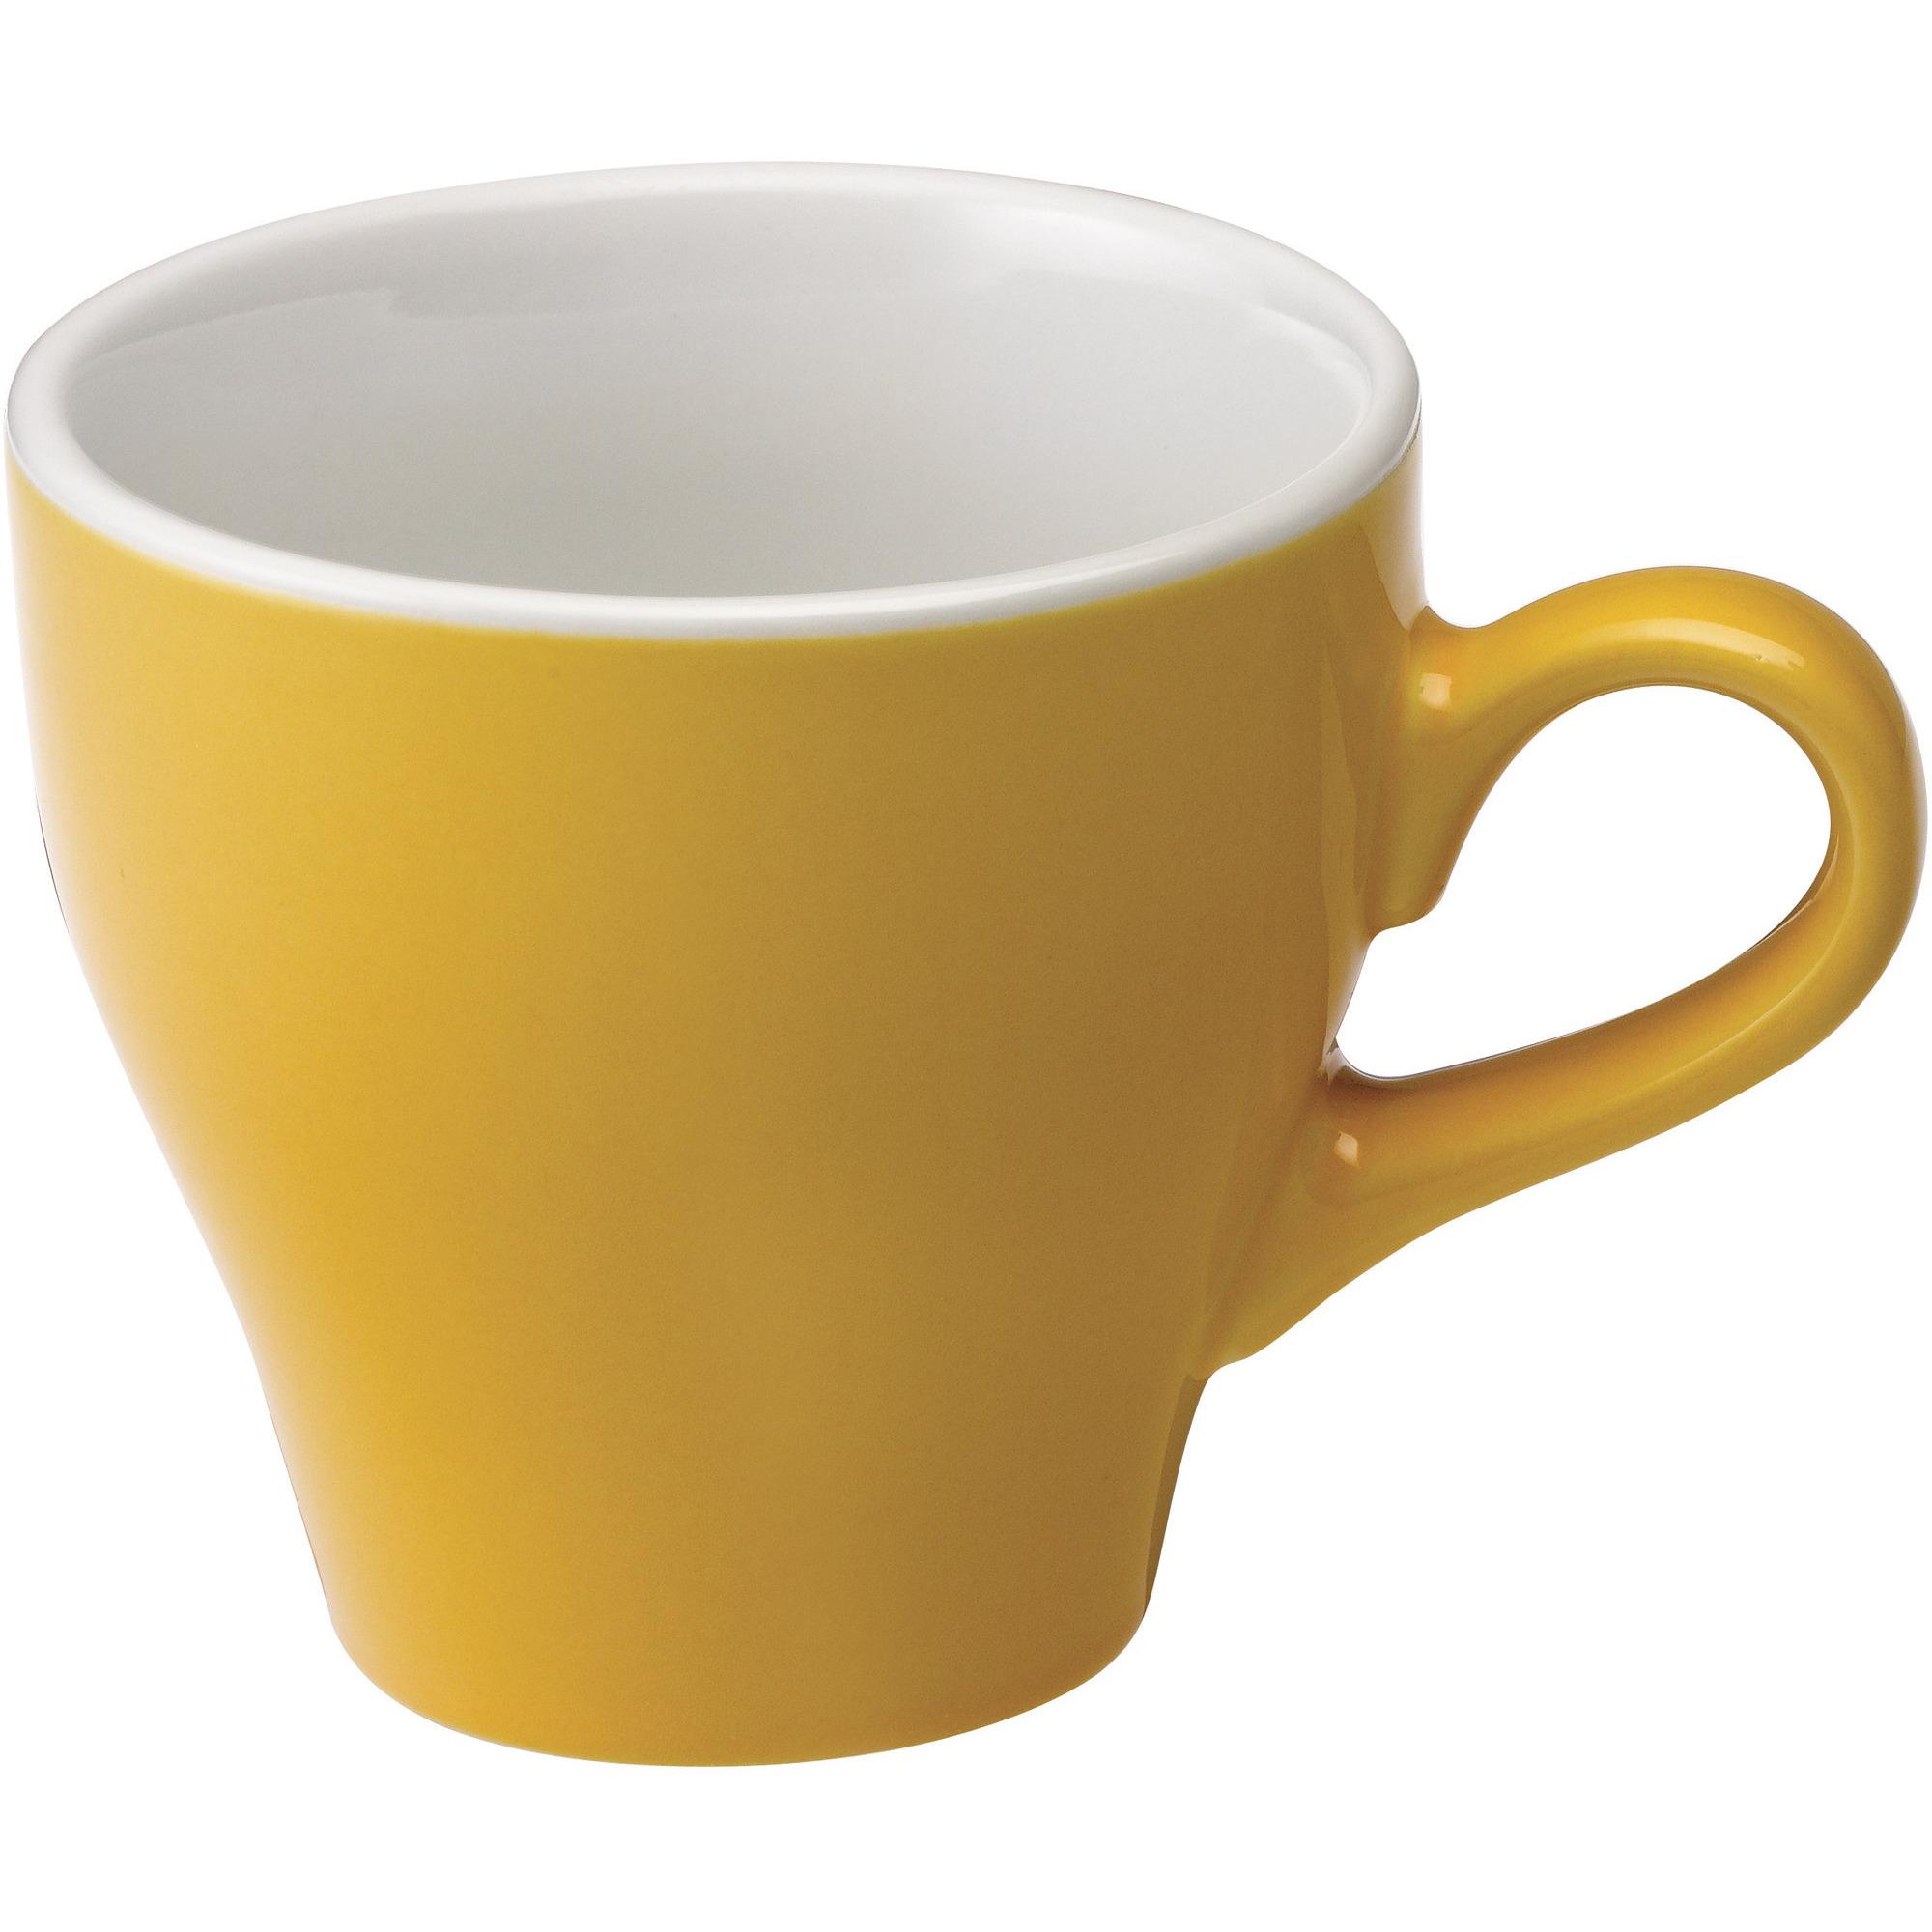 Loveramics Tulip Café Lattekopp 280ml. 6 st. Yellow